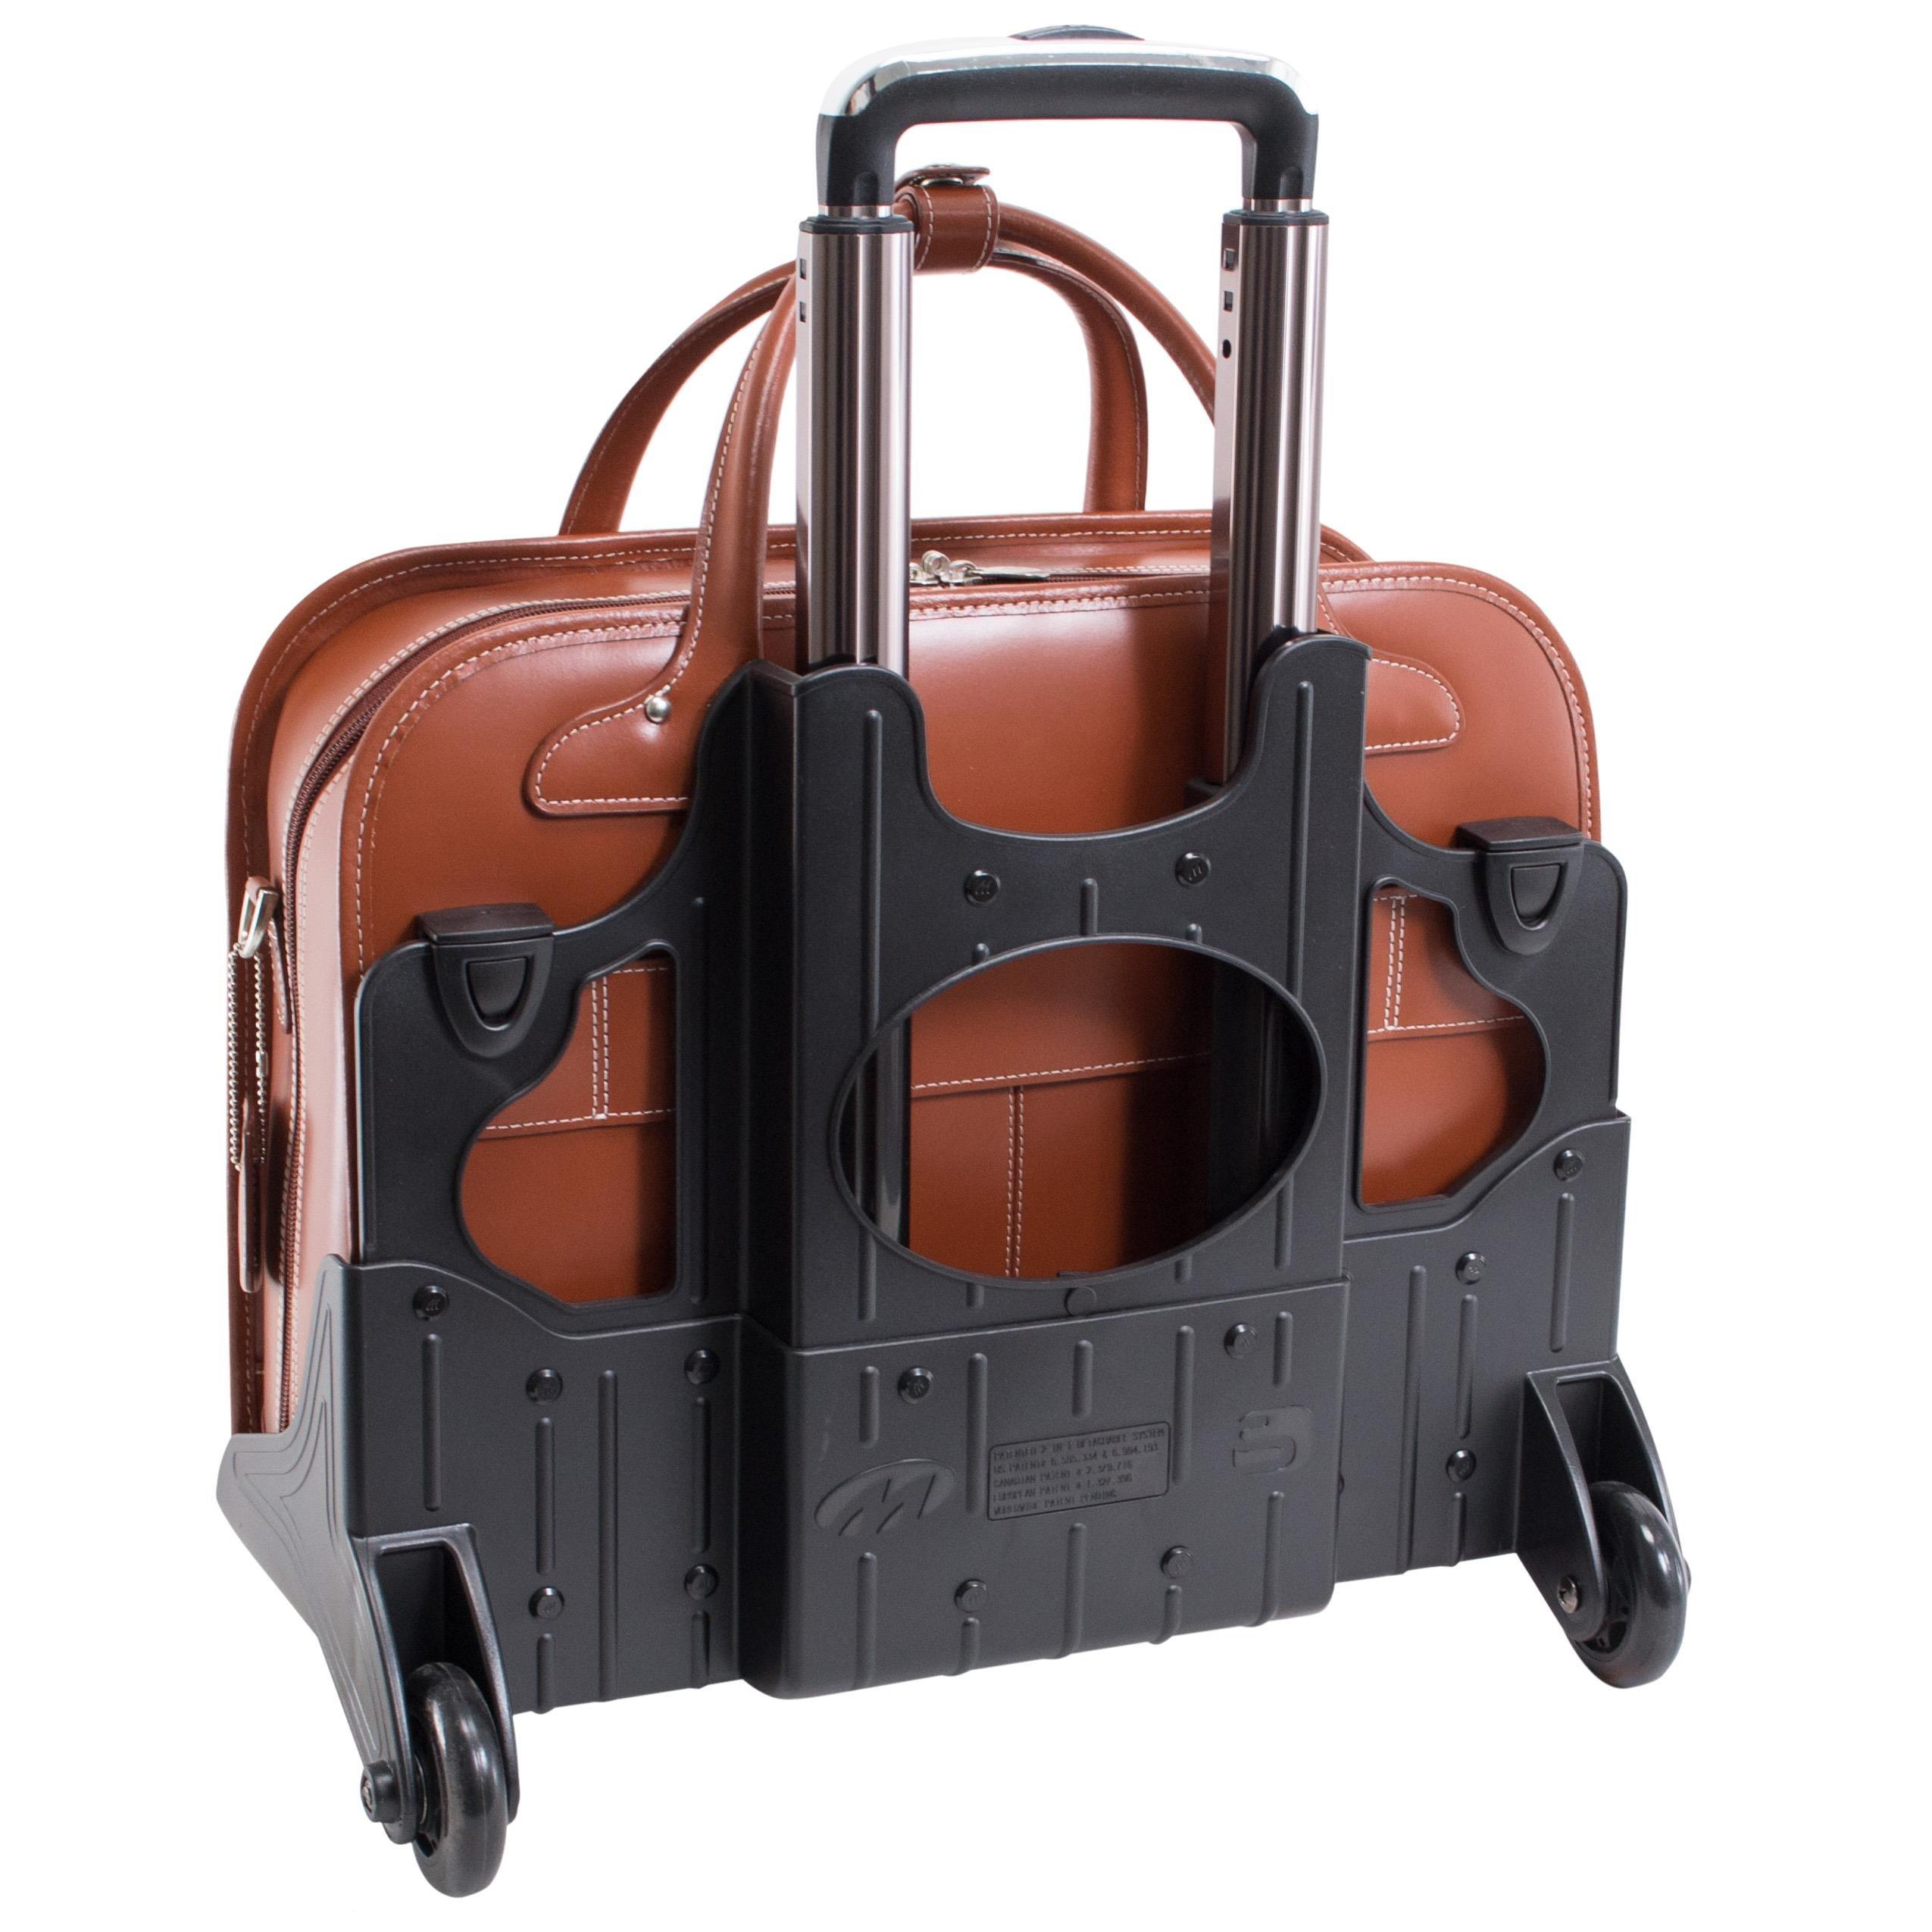 McKleinUSA LAKEWOOD 96615 Black Leather Fly-Through Checkpoint-Friendly Detachable-Wheeled Ladies' Briefcase by McKleinUSA (Image #4)